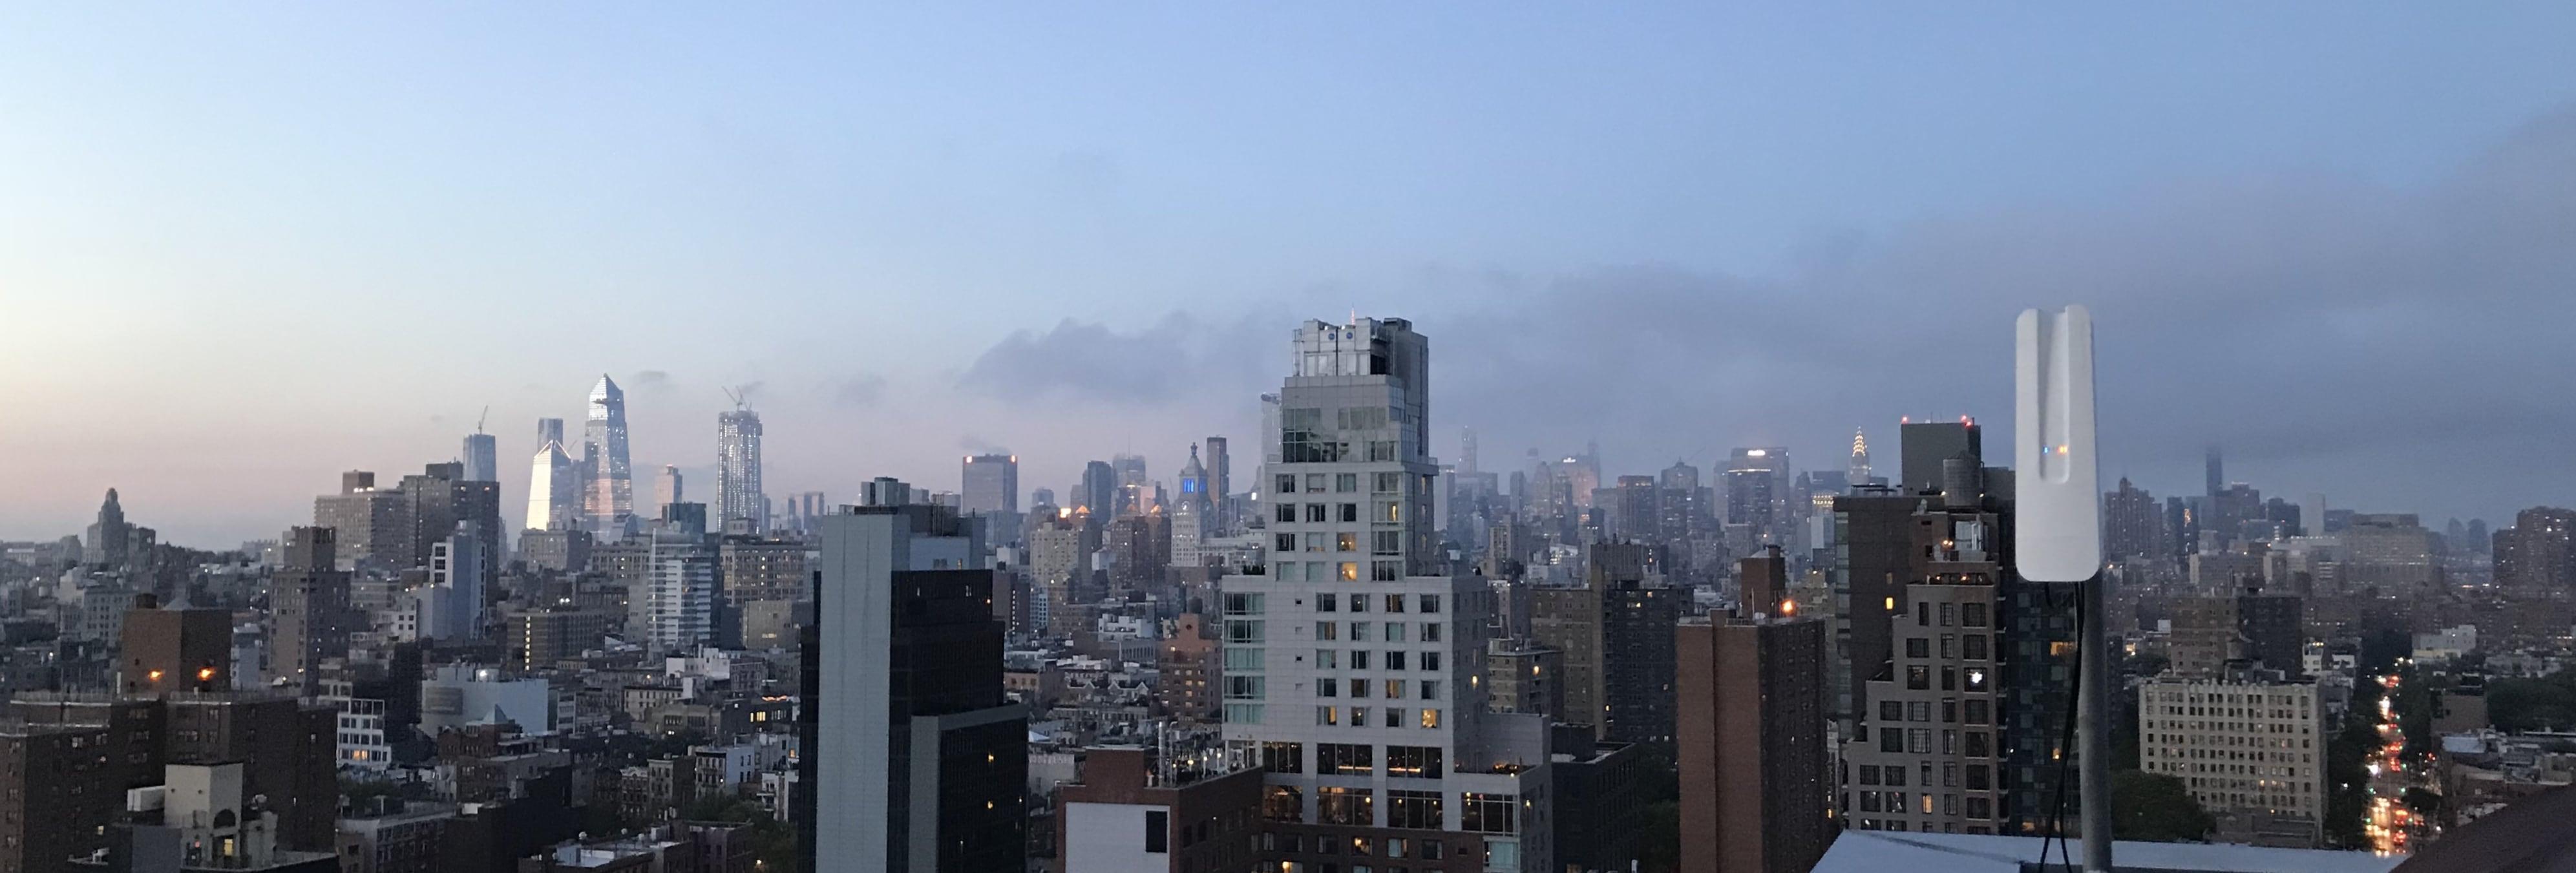 NYC Mesh